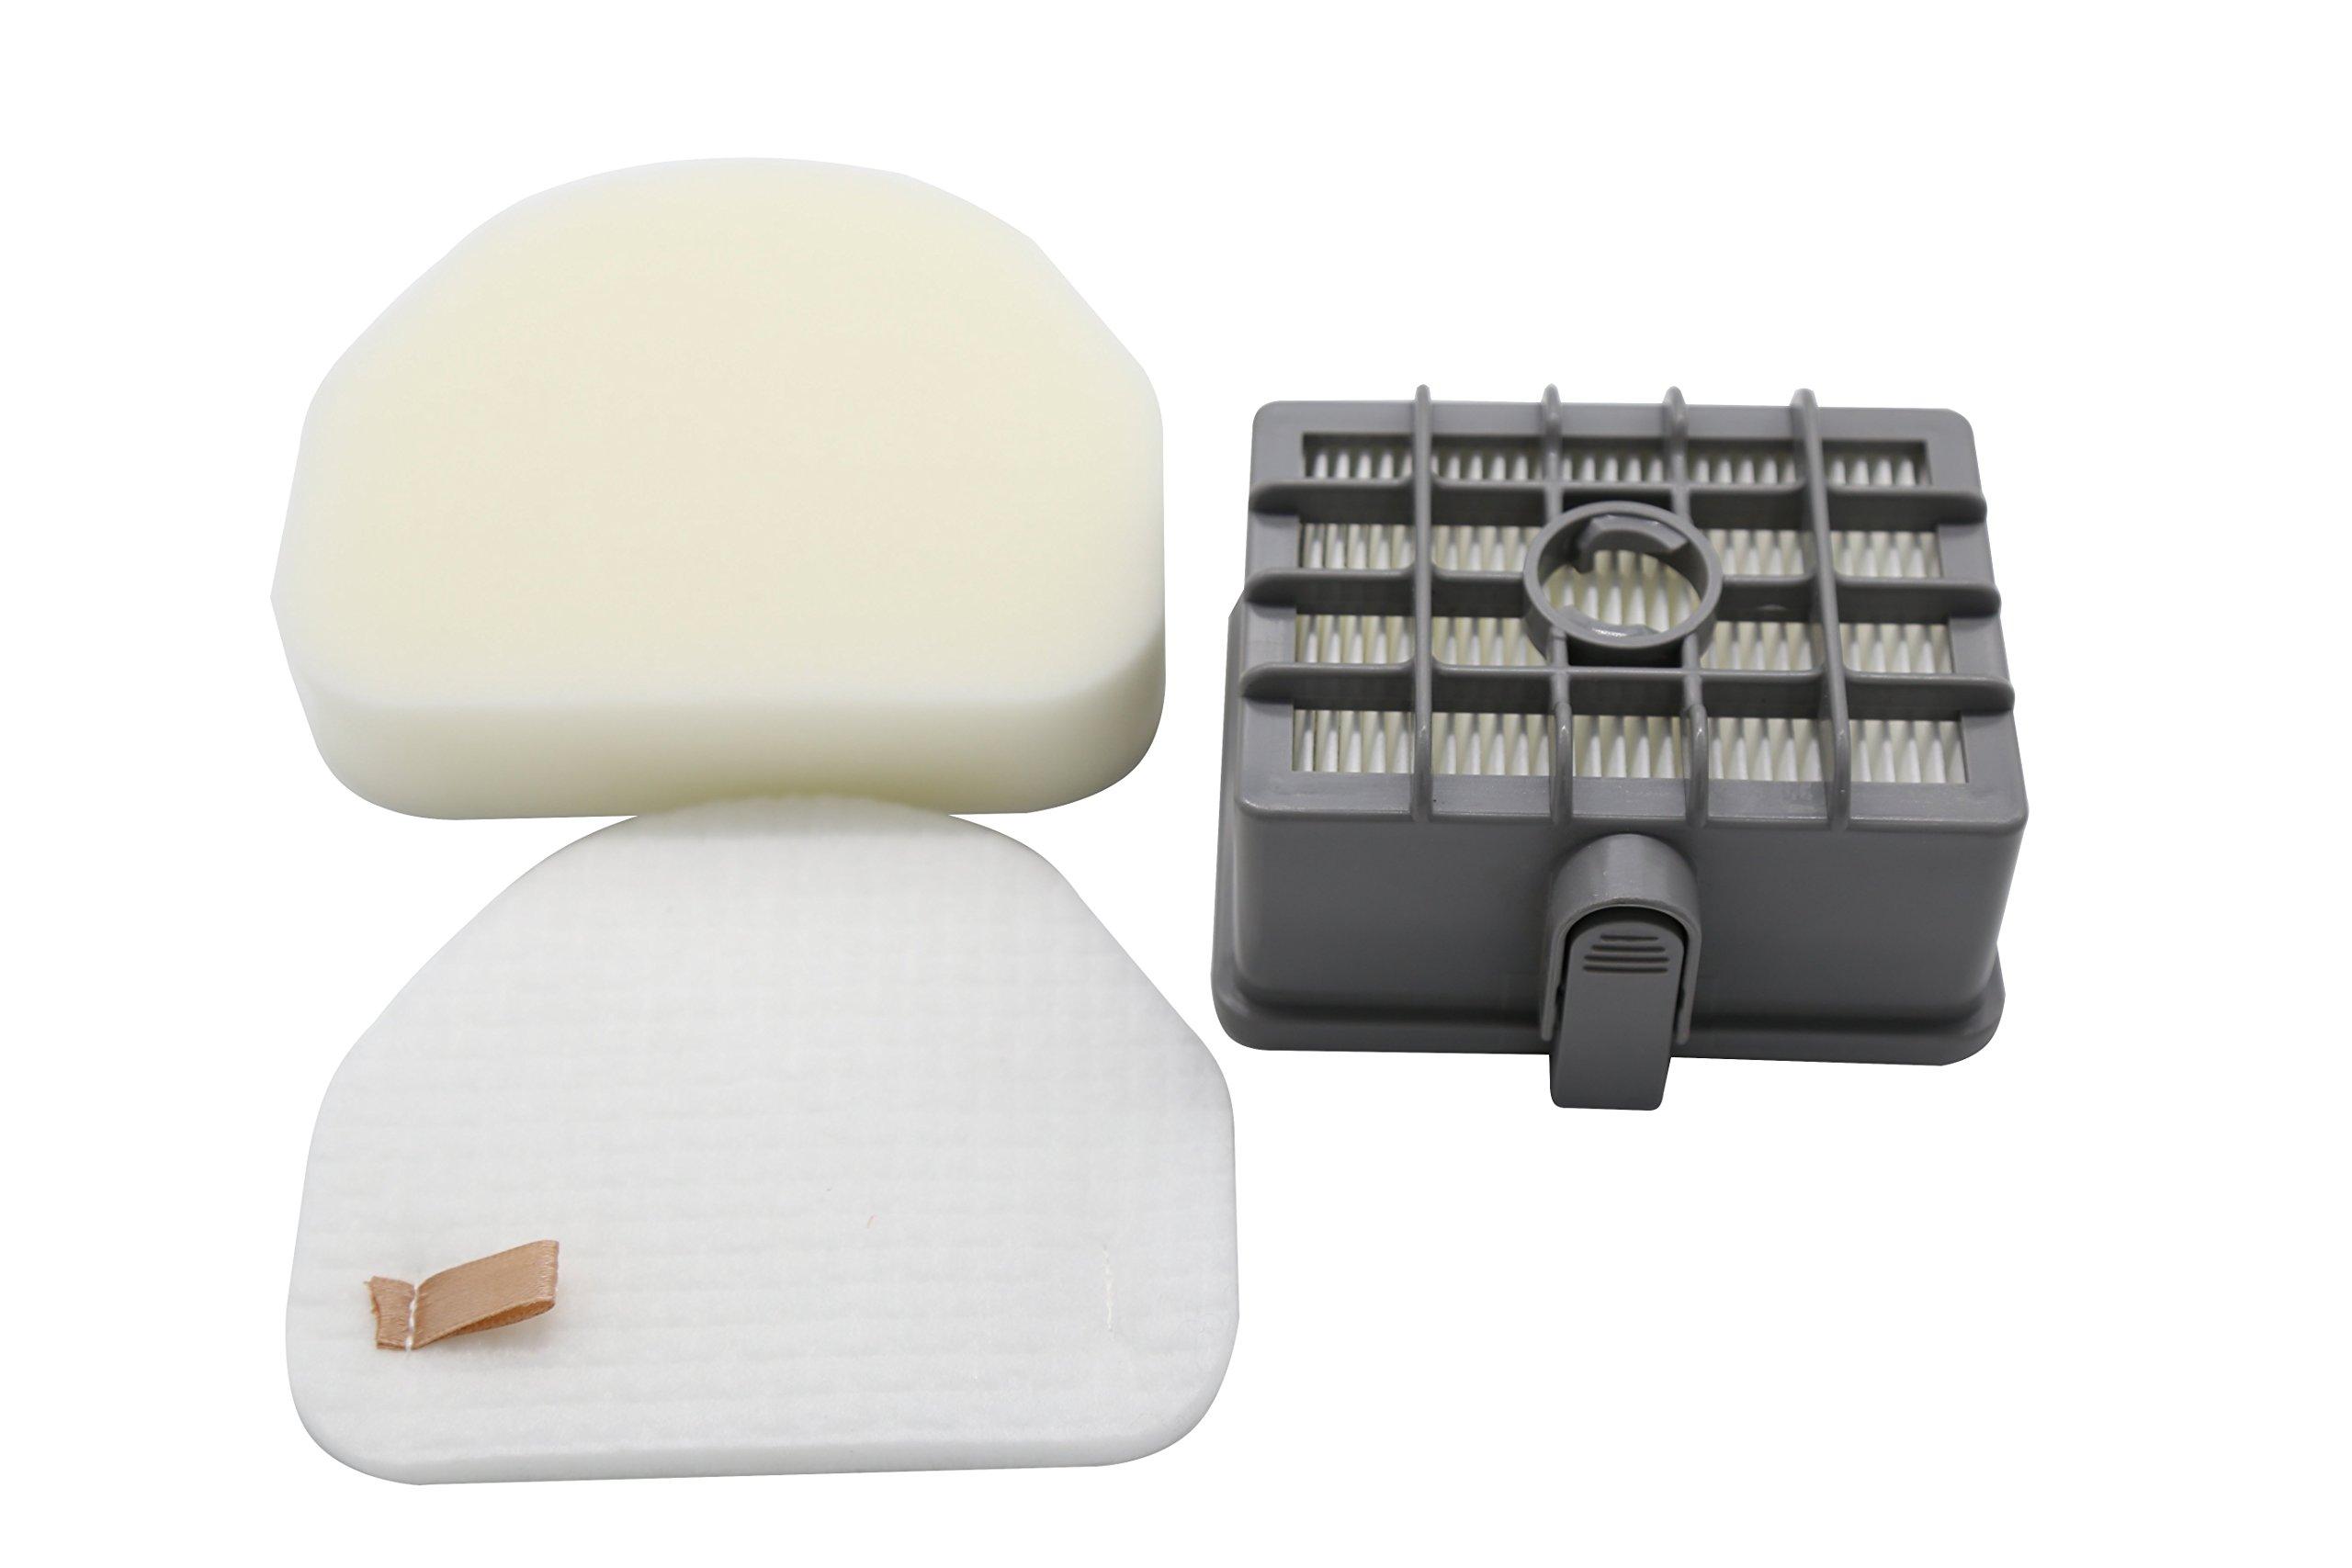 (1 Set) SHARK NV450 Filter Kit: 1 HEPA XL Rotator Filter, 1 Foam & 1 Felt Filter, Fits Shark NV450 XL Vacuums, Compares to Parts # XHF450 & XFF450. Genuine Gold Line filters.